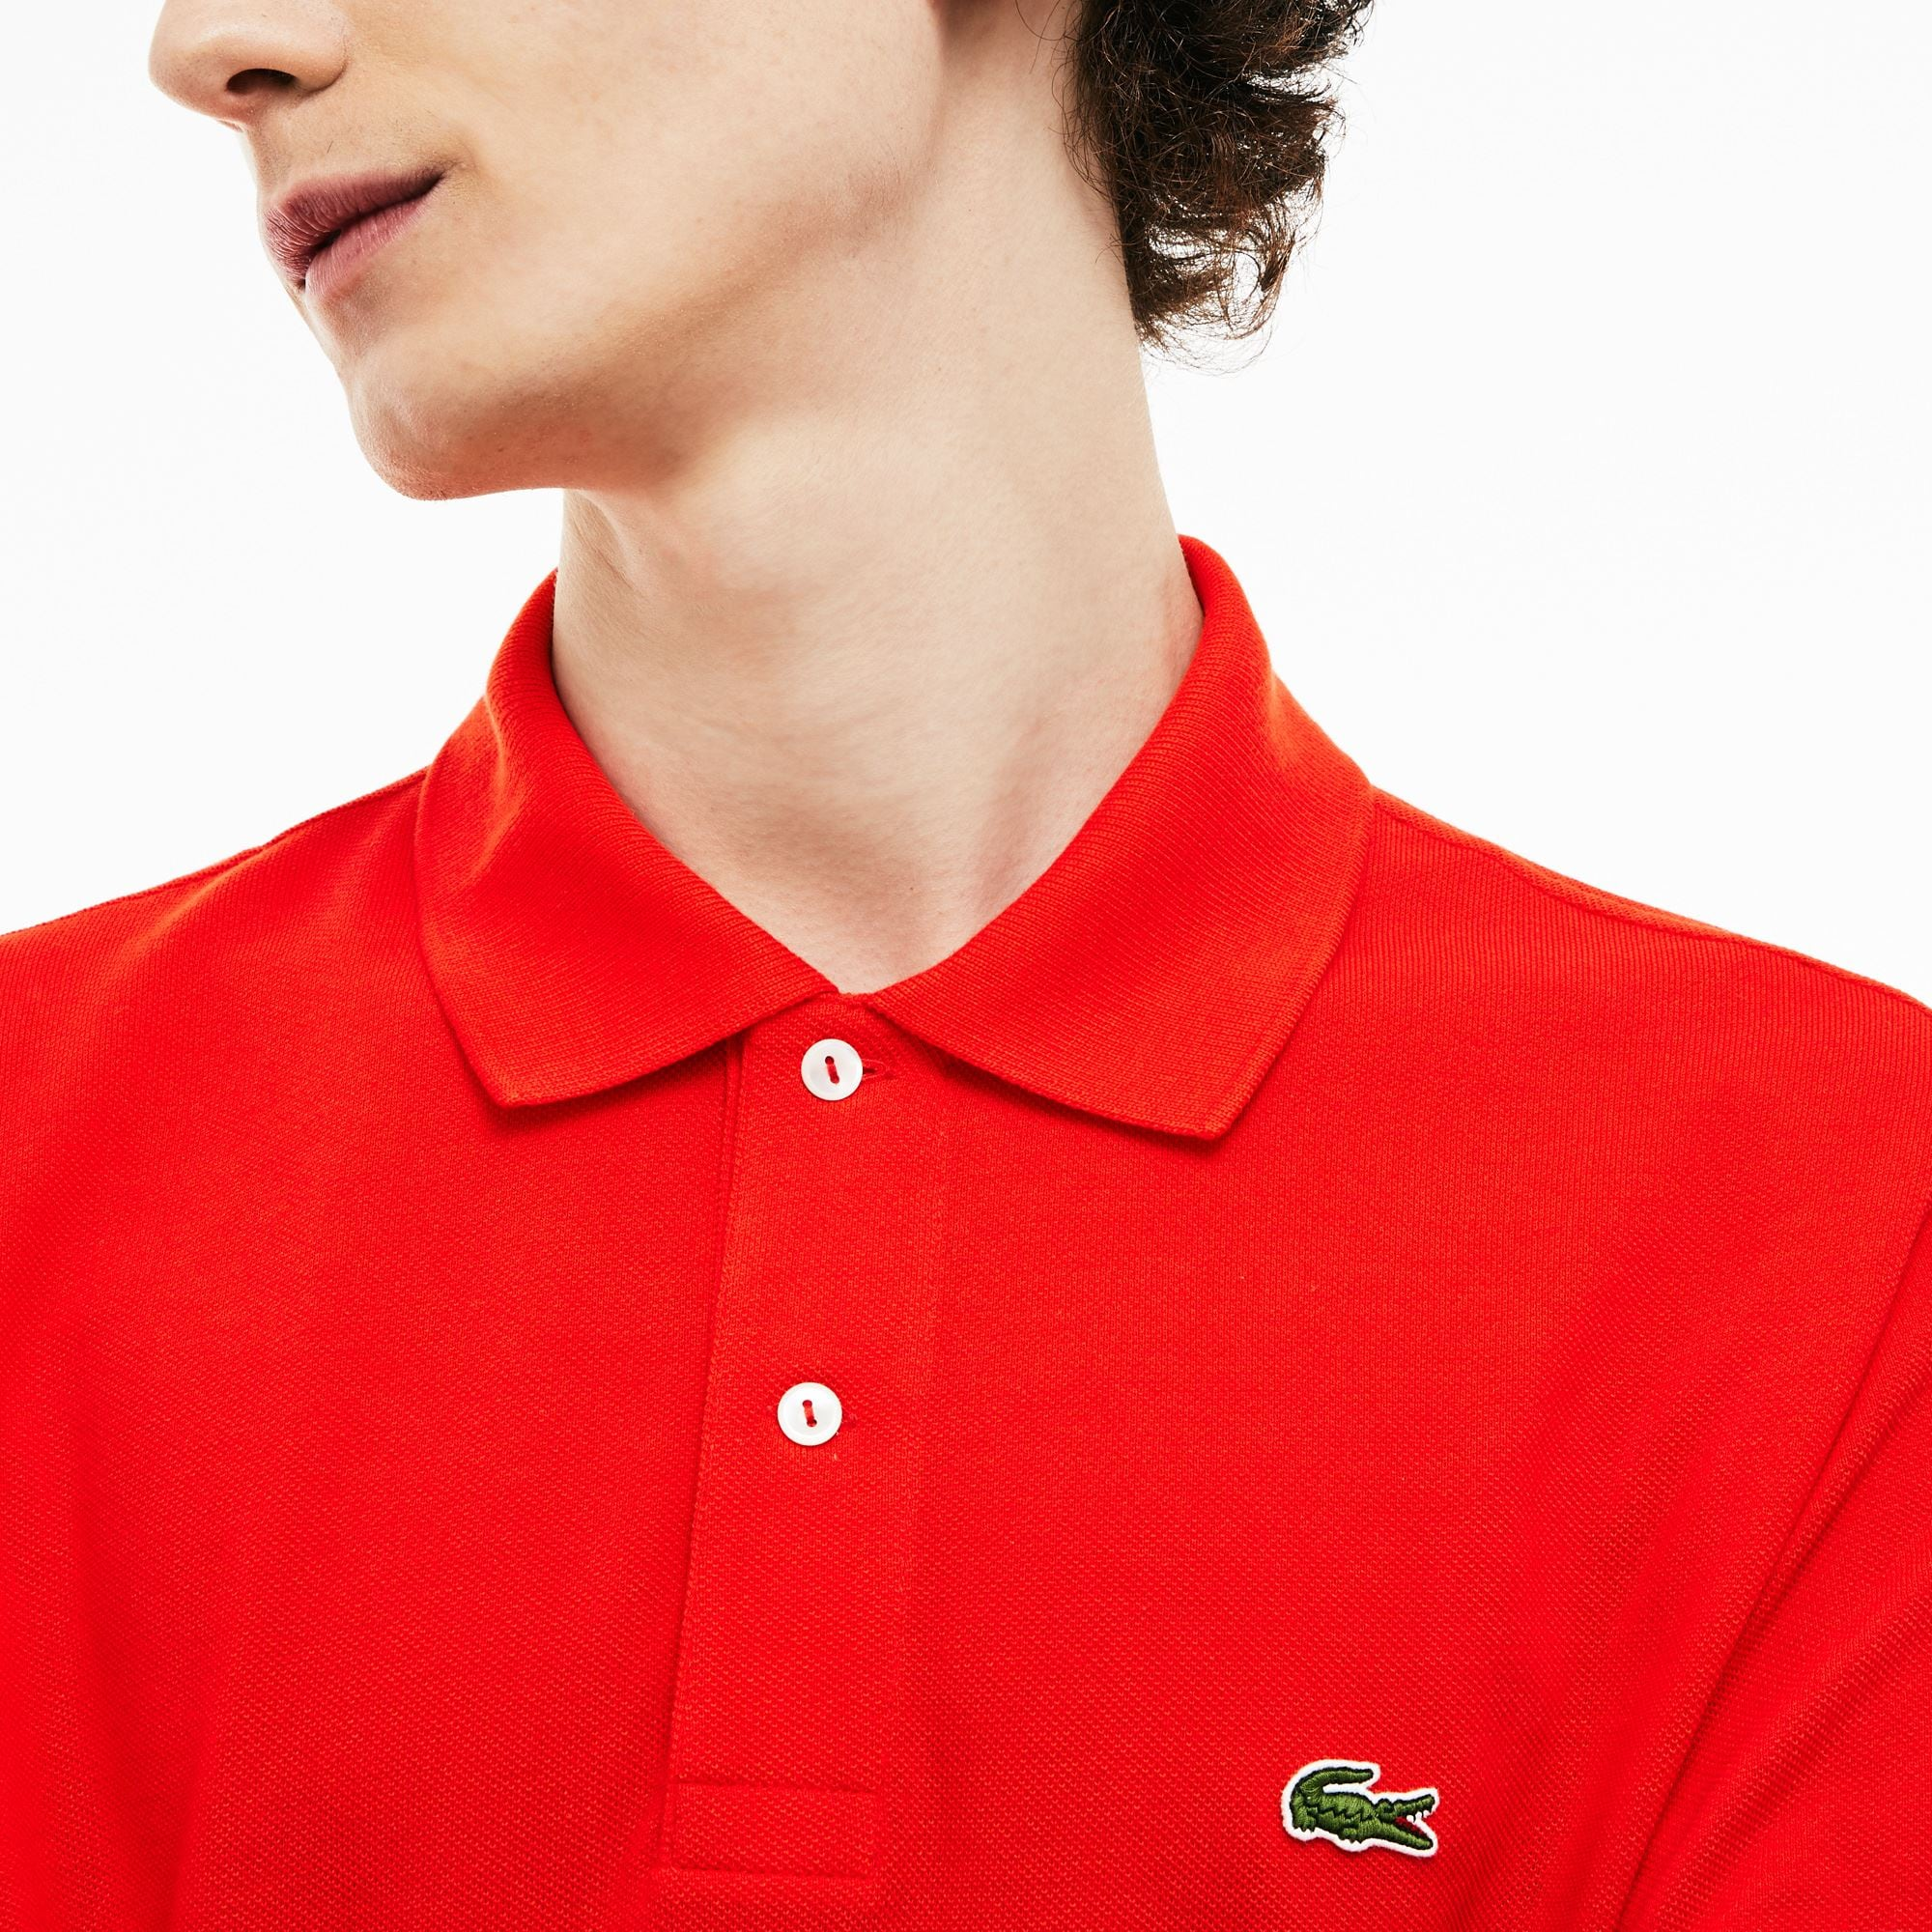 premier taux 93301 1bafb Lacoste Classic Fit L.12.12 Polo Shirt